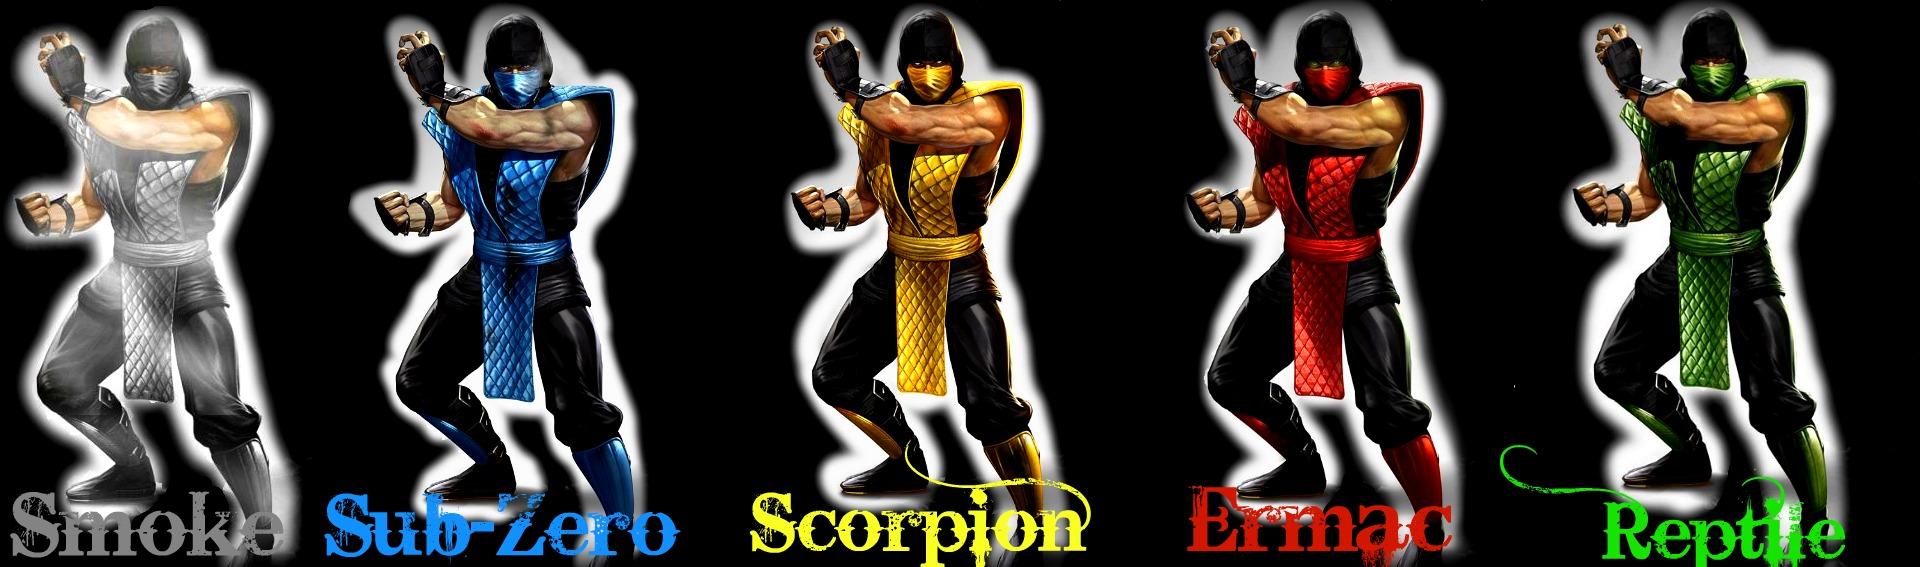 Mortal Kombat 9:Classic Ninjas by IamObiWanKenobi on DeviantArt